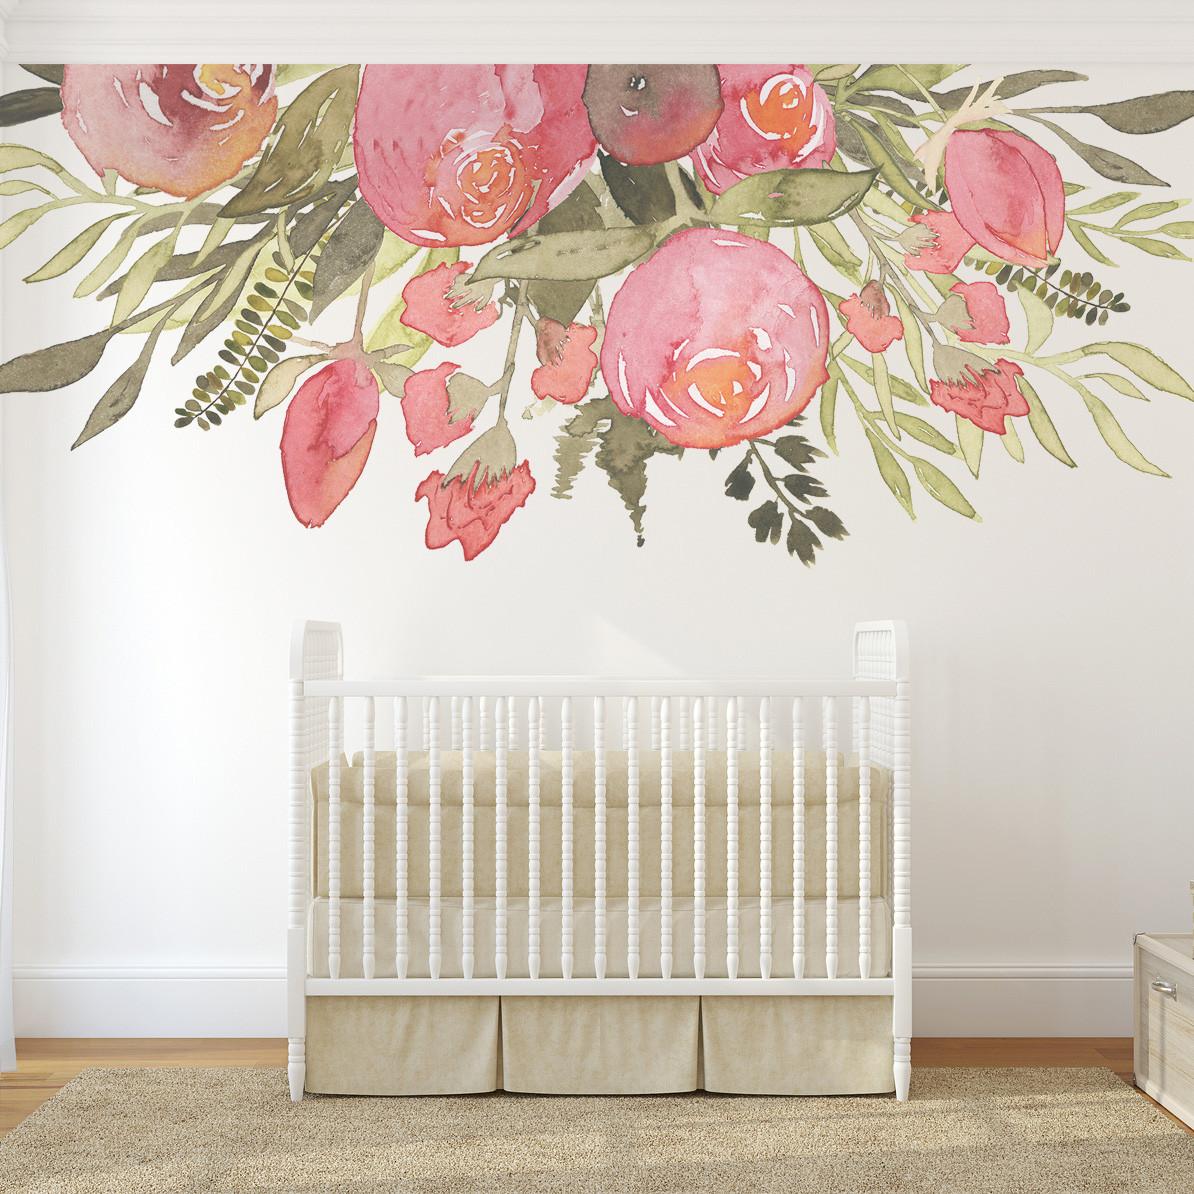 Home Decor 24 Flowers Girls Bedroom Stickers Wall Decals Nursery Fibsol Com